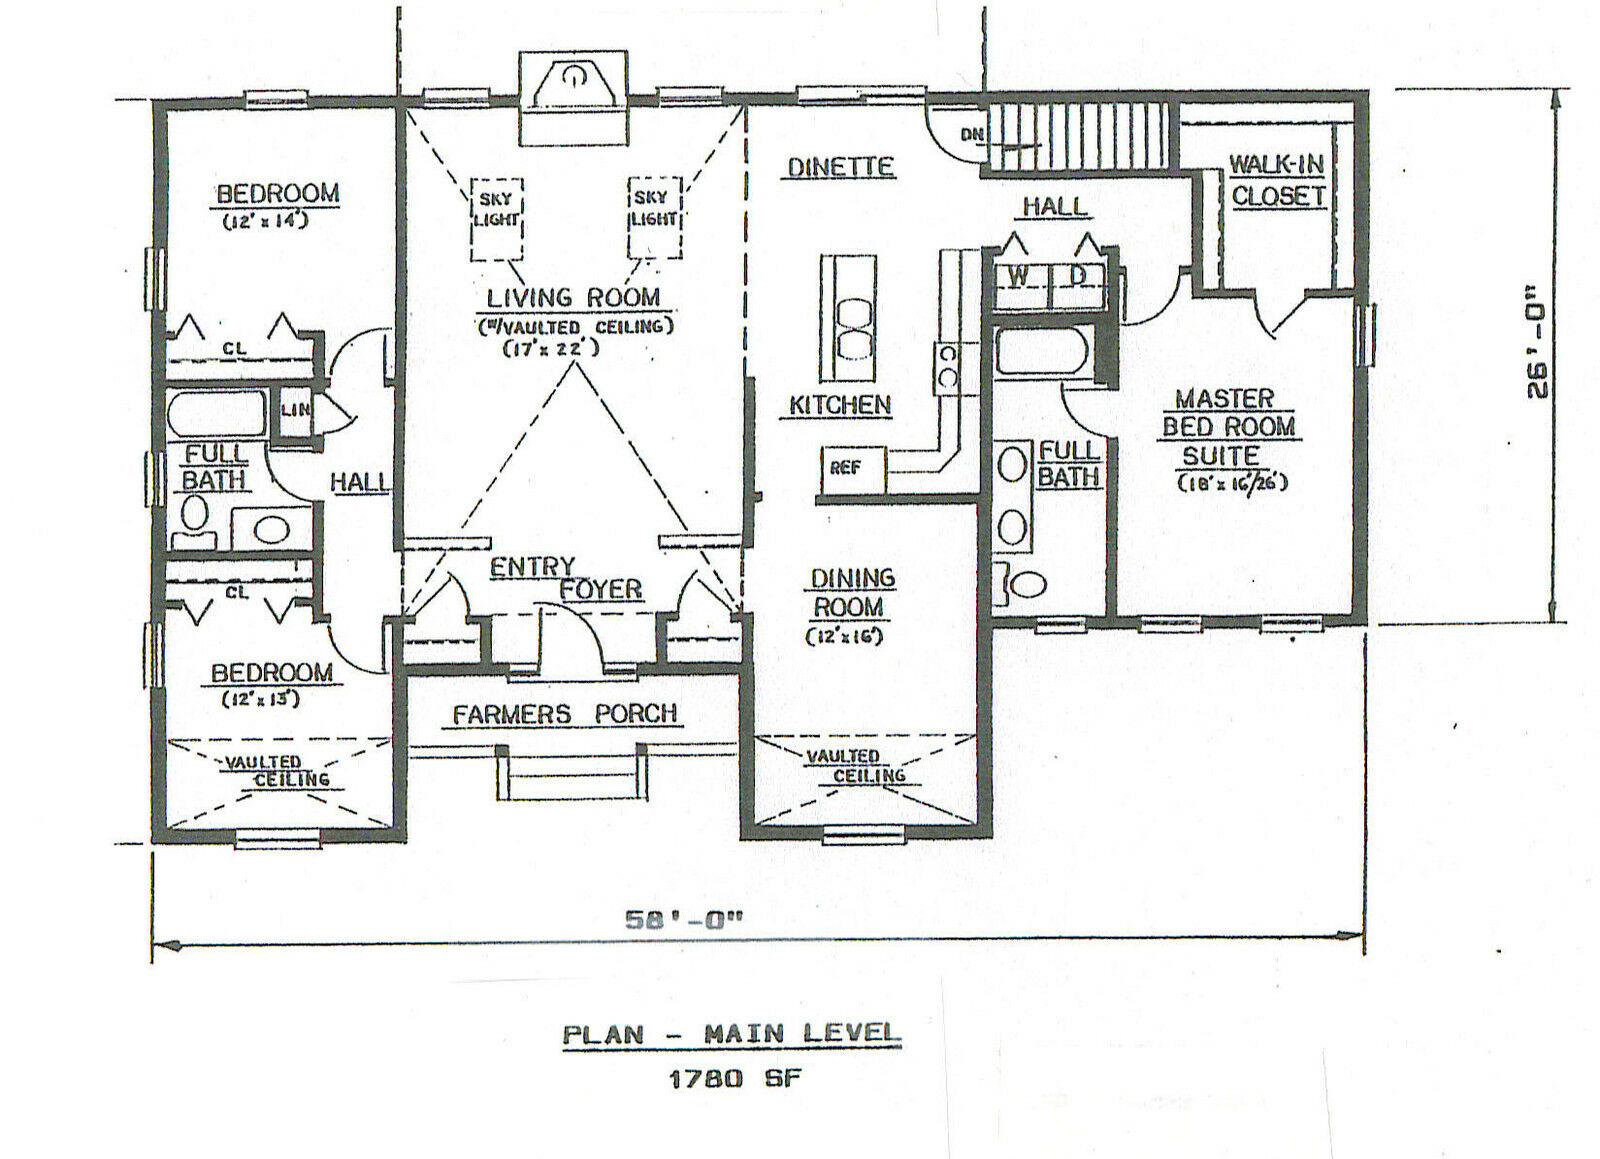 3 bdrm 2 bath 1780 sf hip roof ranch 2 car garage under house building plans picclick - House plans with garage below ...